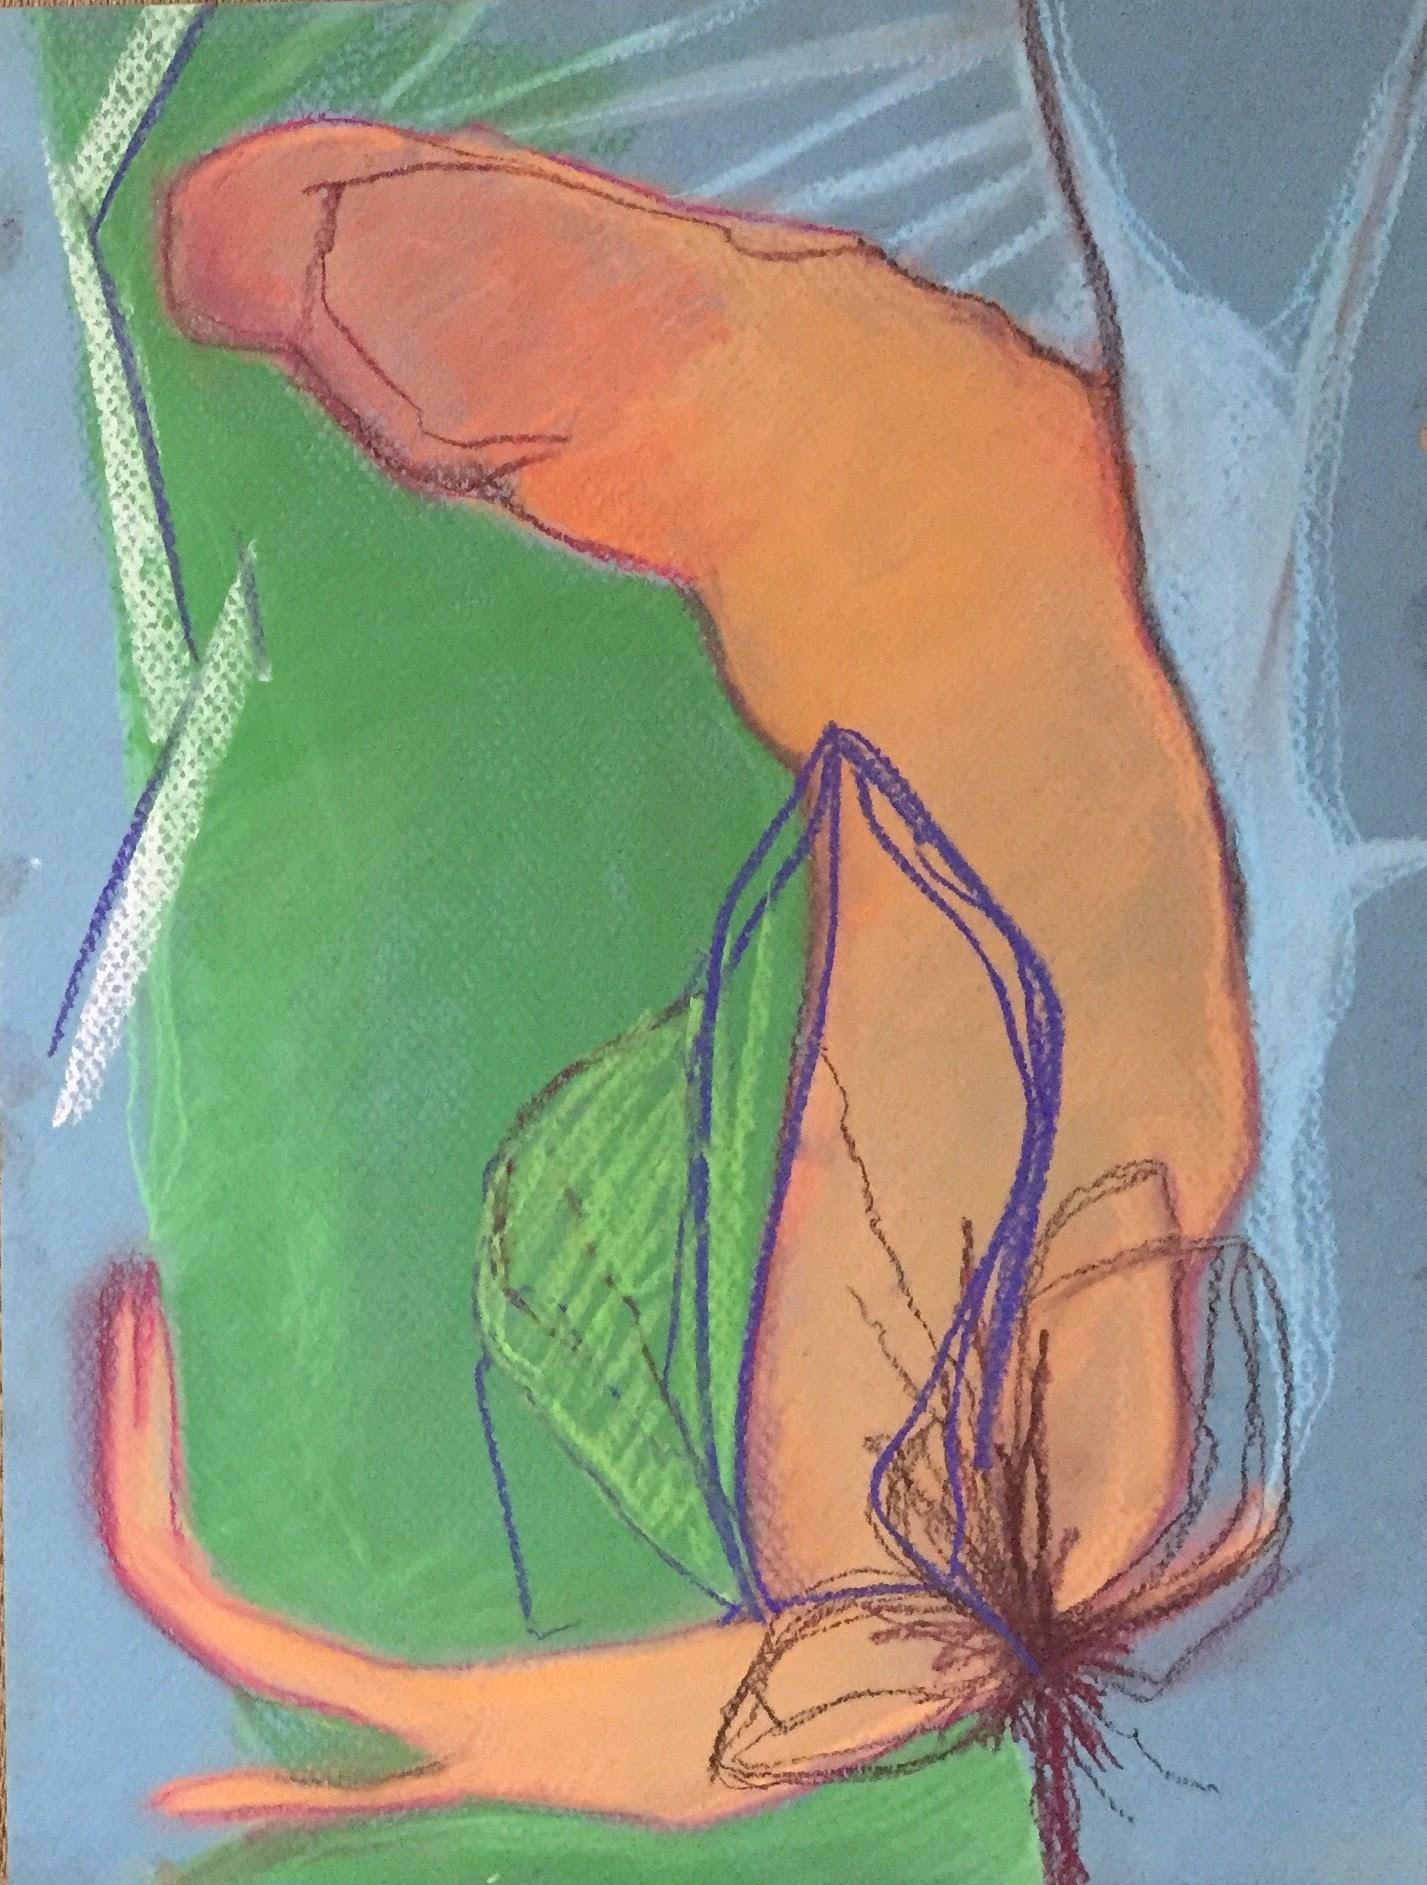 Animus 9 x 12 | Pastel on paper